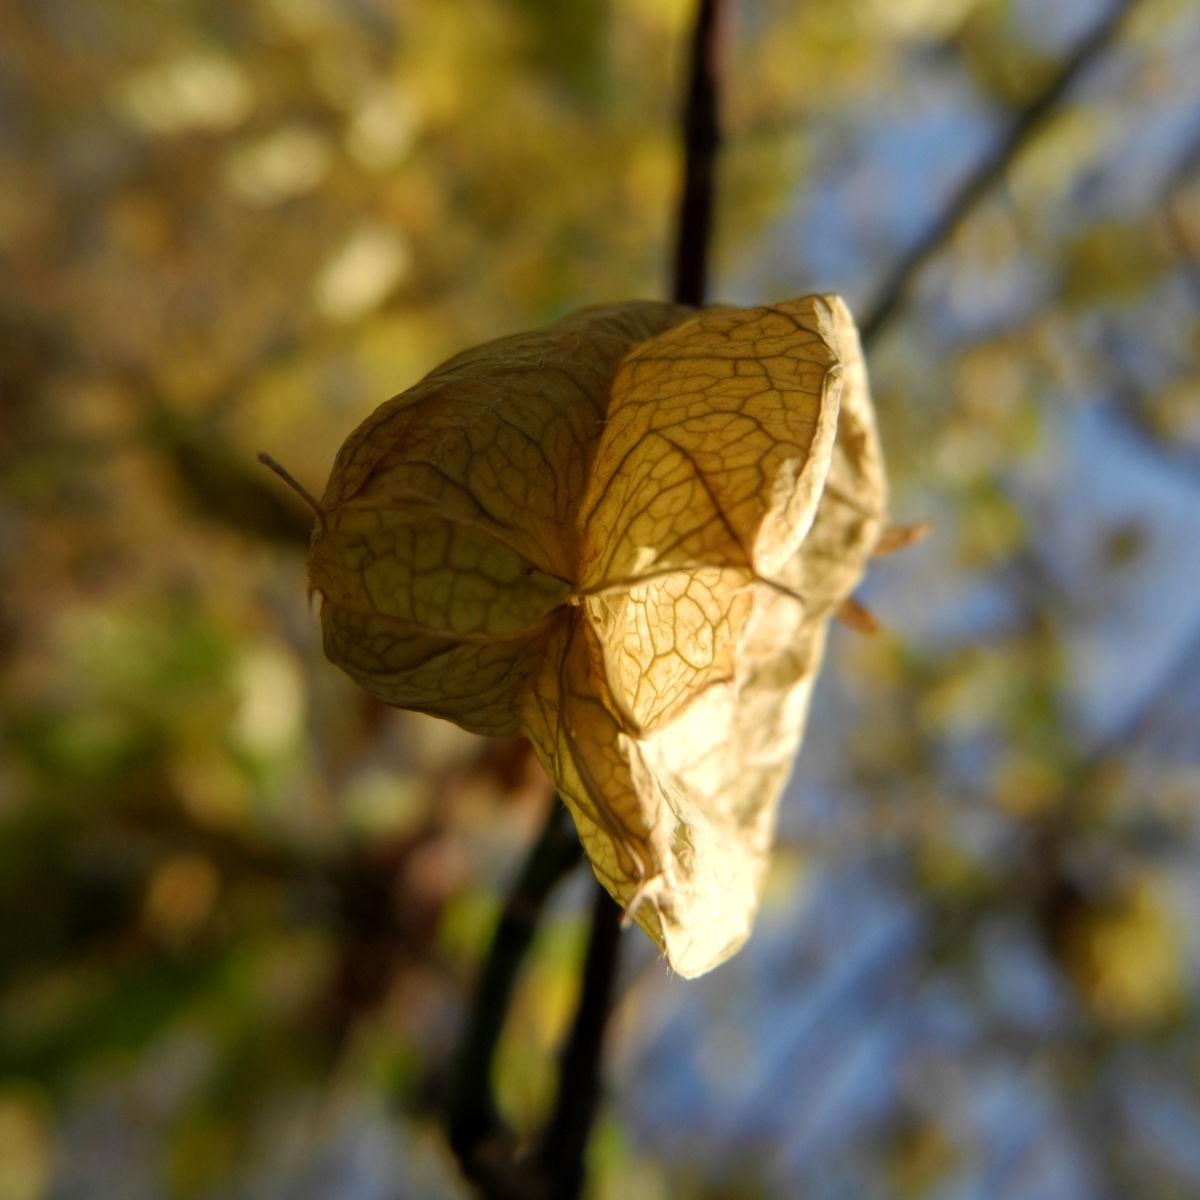 amerikanische pimpernuss samen kapsel staphylea trifolia